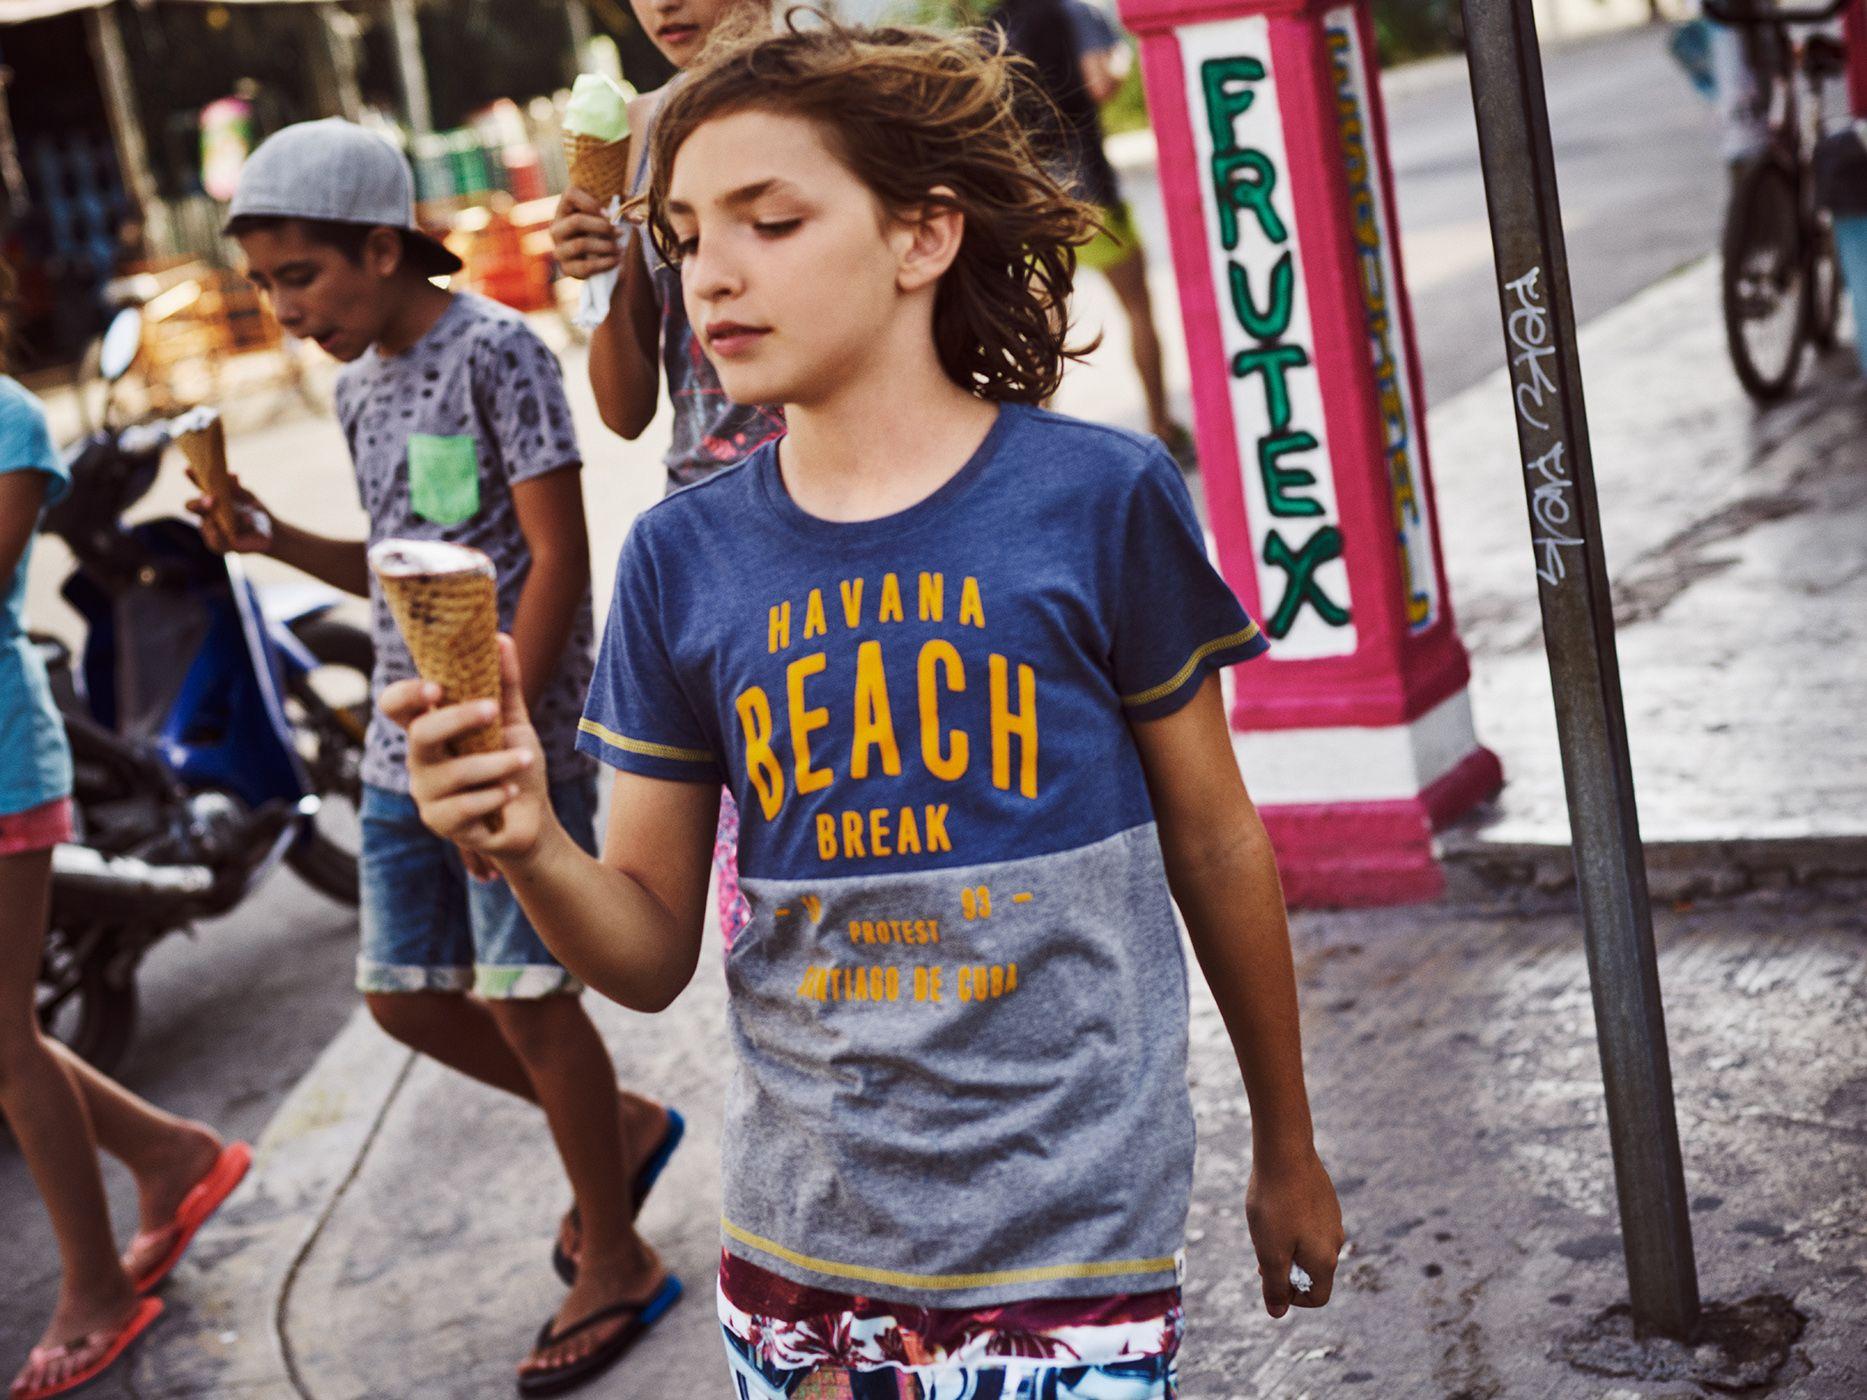 Icecream Summer Sun Protest Sportswear Kids Collection Sportswear Outfits Mens Sportswear Men Sport Outfit